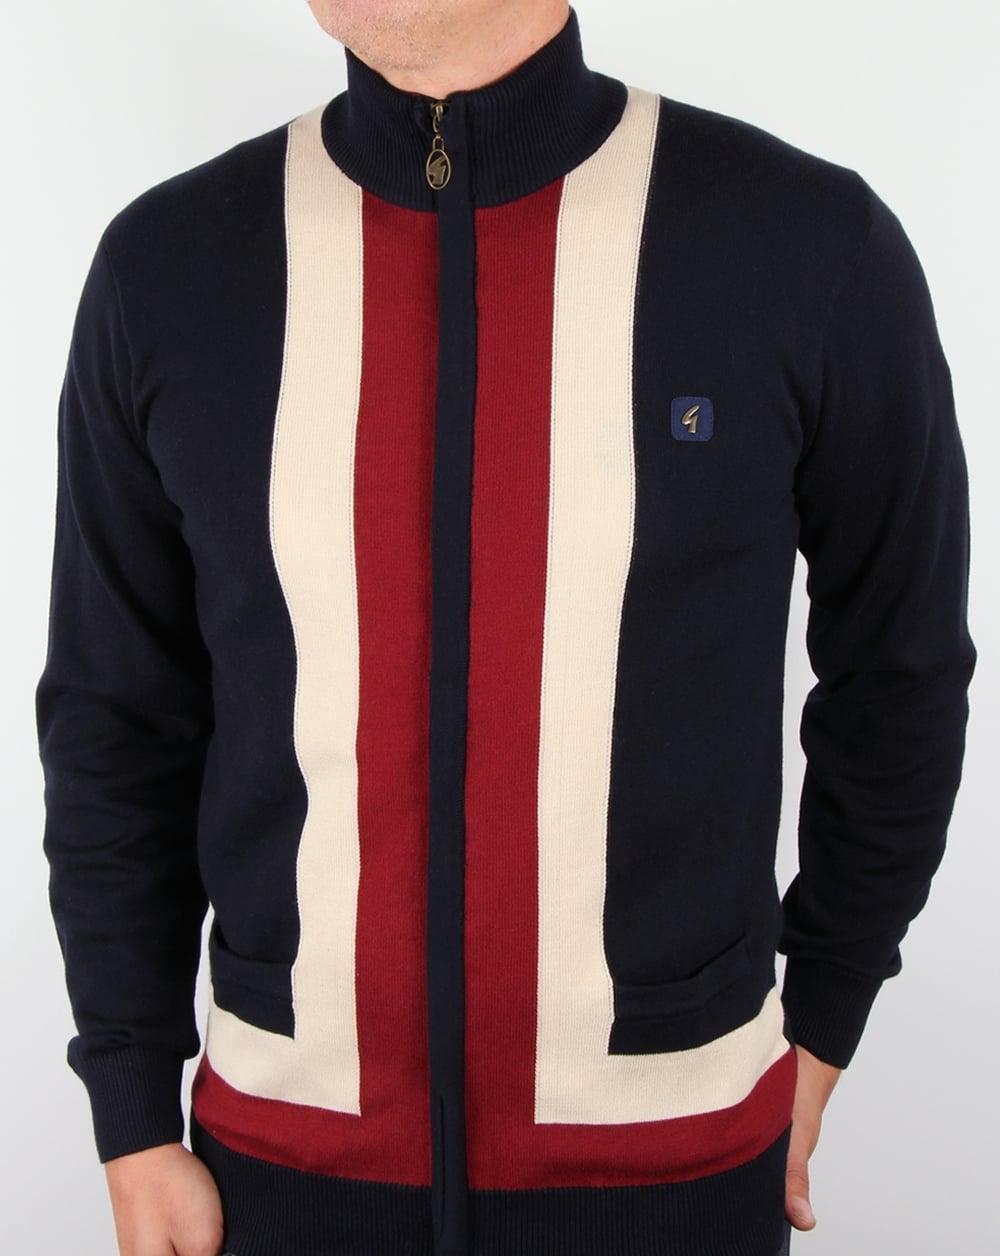 Gabicci Vintage Zip Cardigan Navy,jumper,sweater,knit,mens